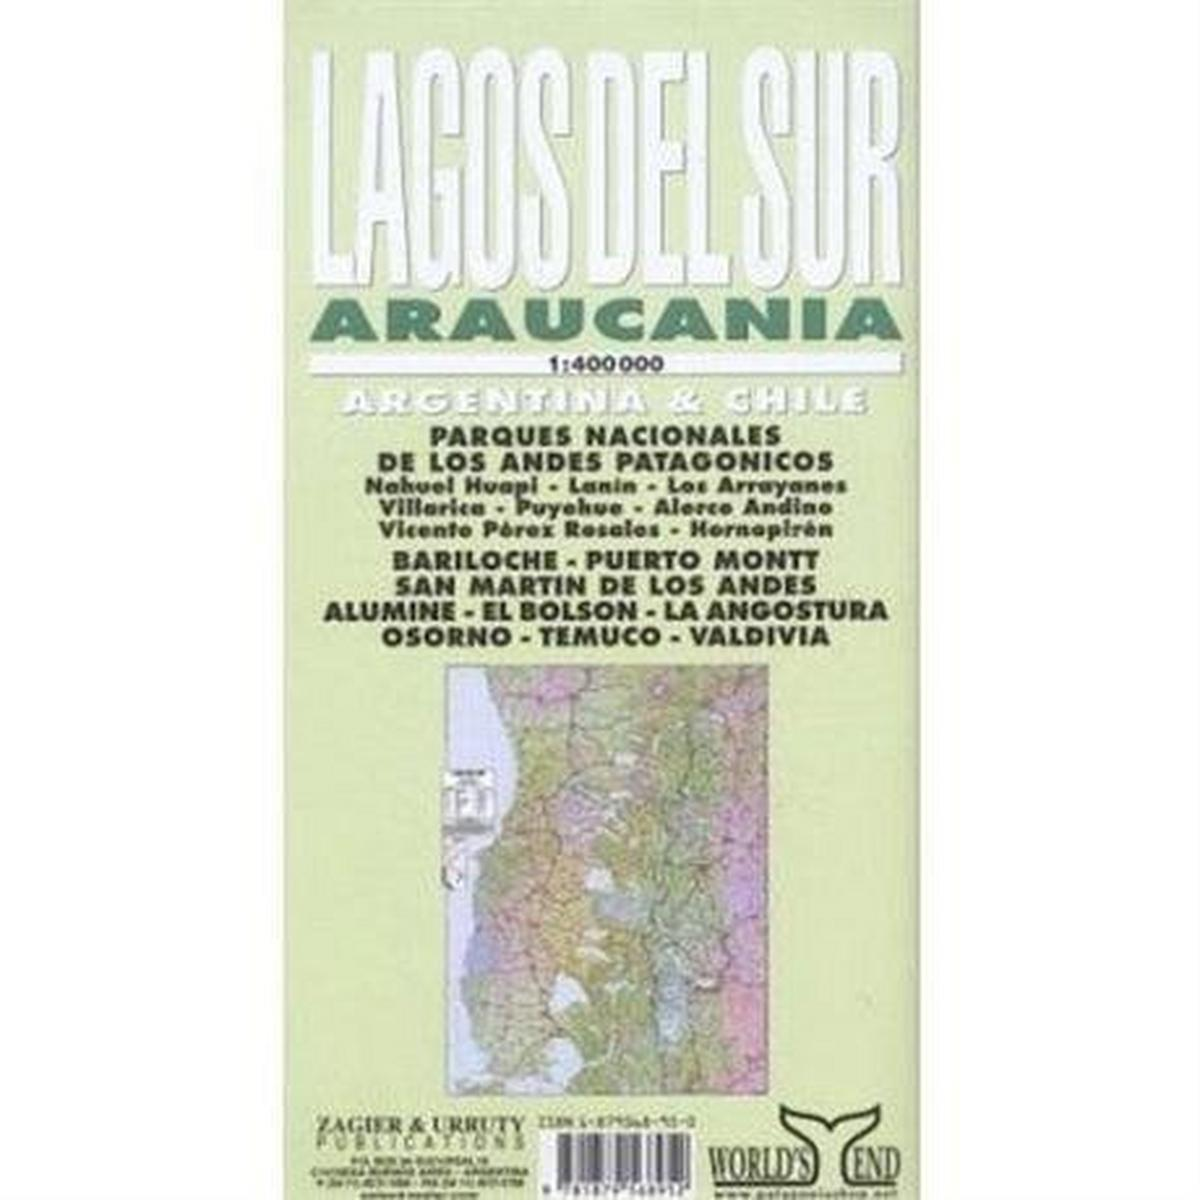 Miscellaneous Chile Map: Lagos del Sur - Araucania (Argentina/Chile) 1:400,000